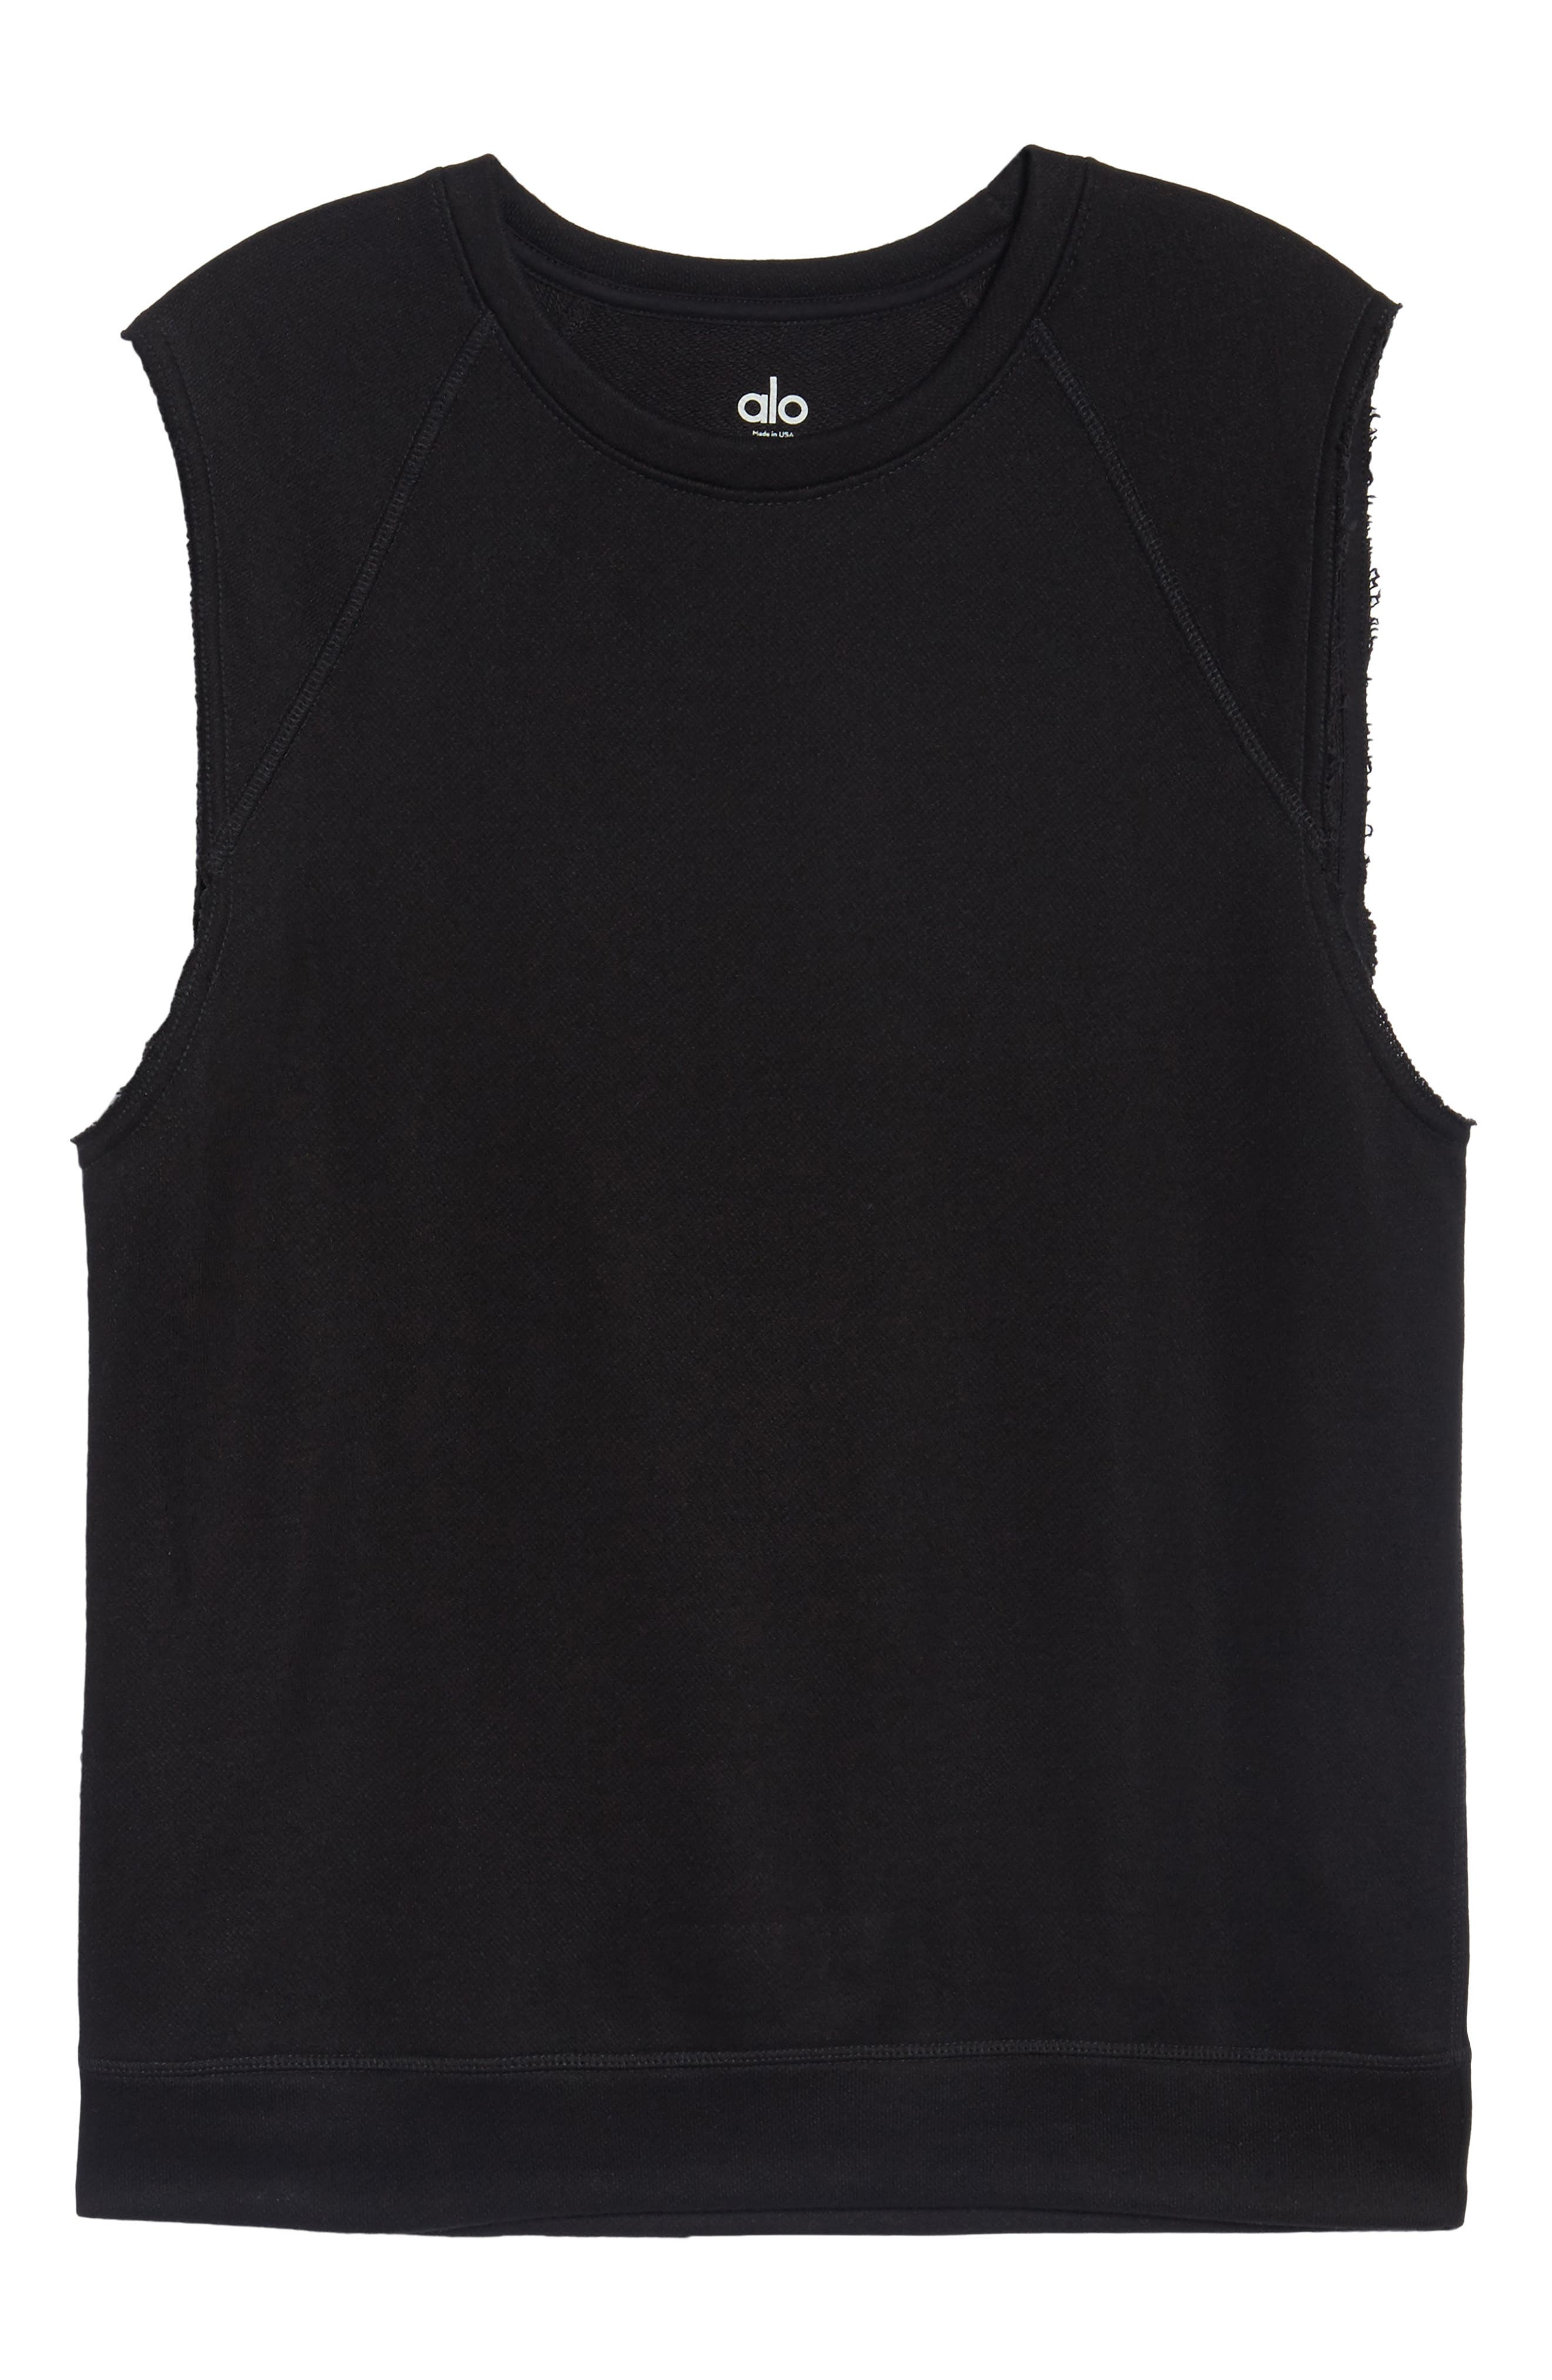 Dosha Relaxed Fit Sweatshirt Tank,                             Alternate thumbnail 6, color,                             BLACK